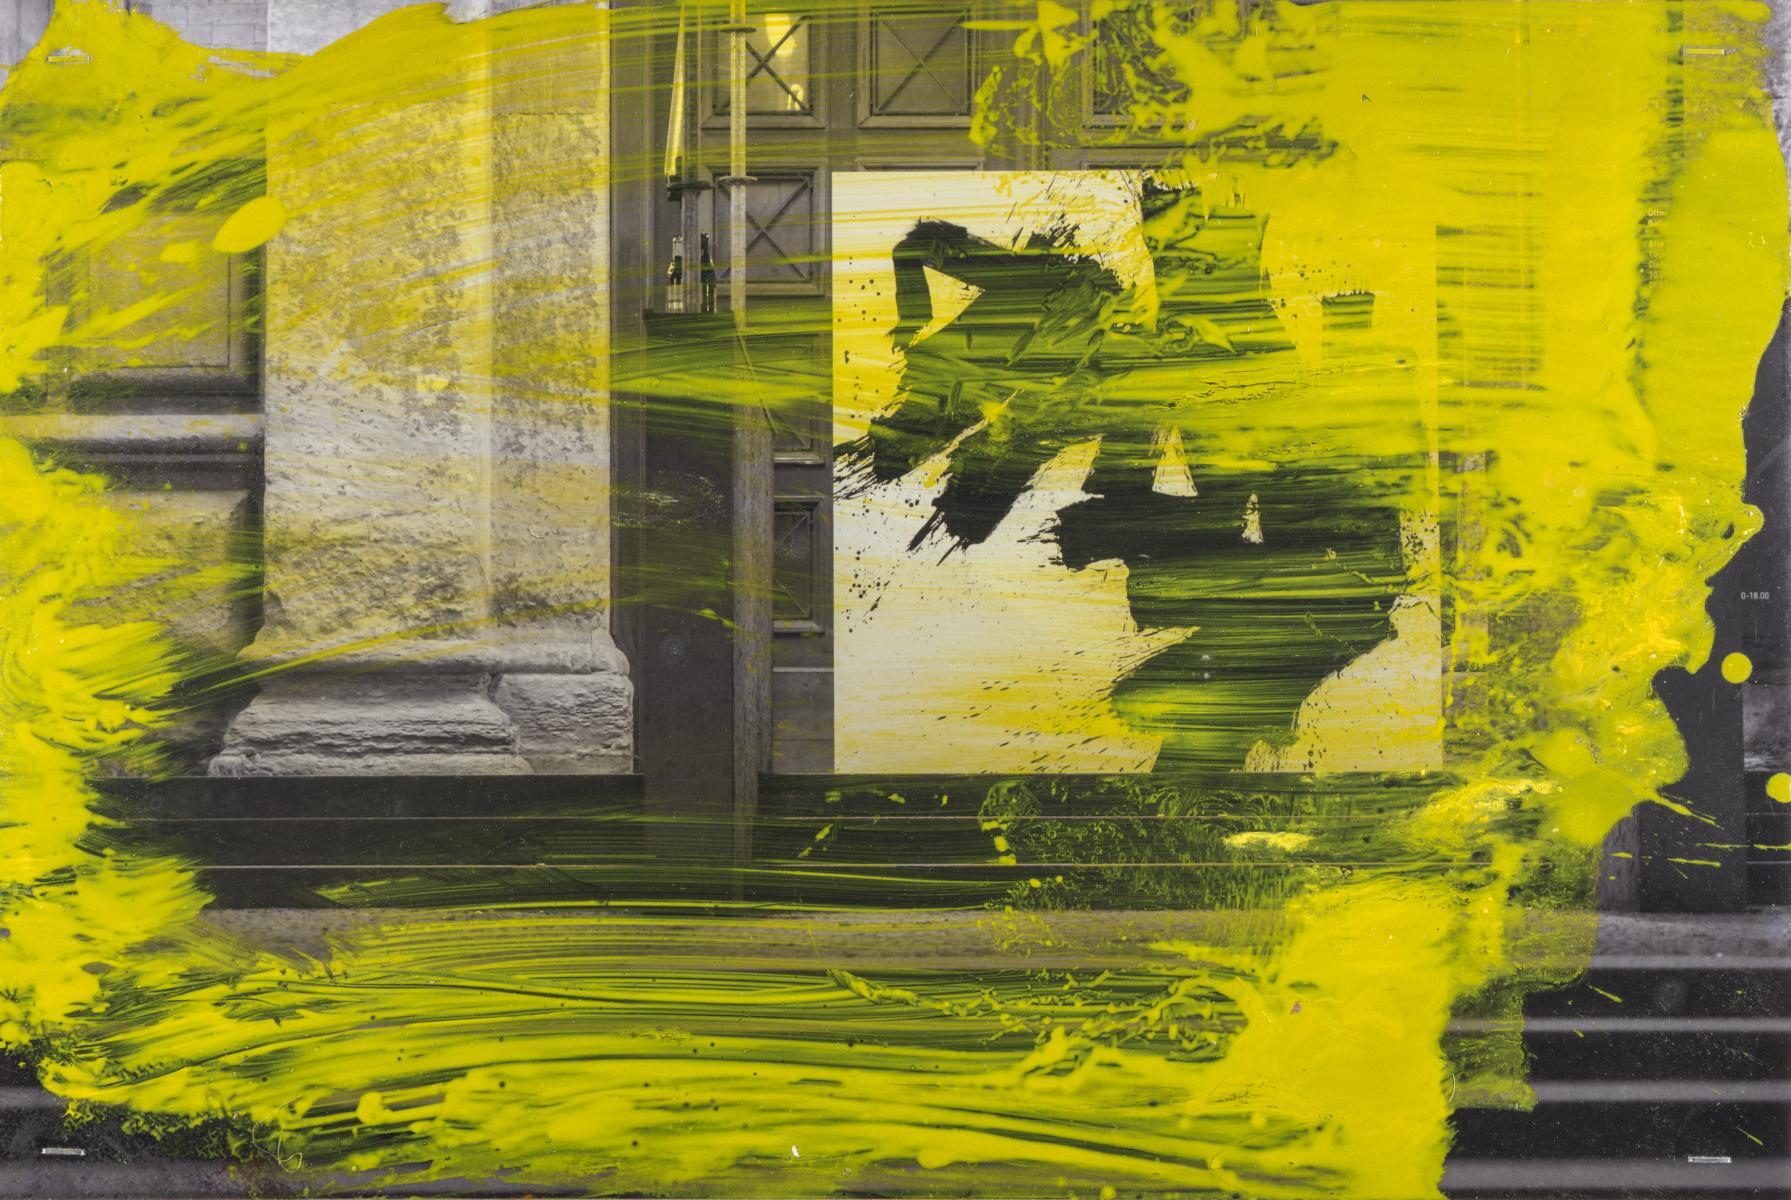 Serie pittura oscura – München / Afraid I